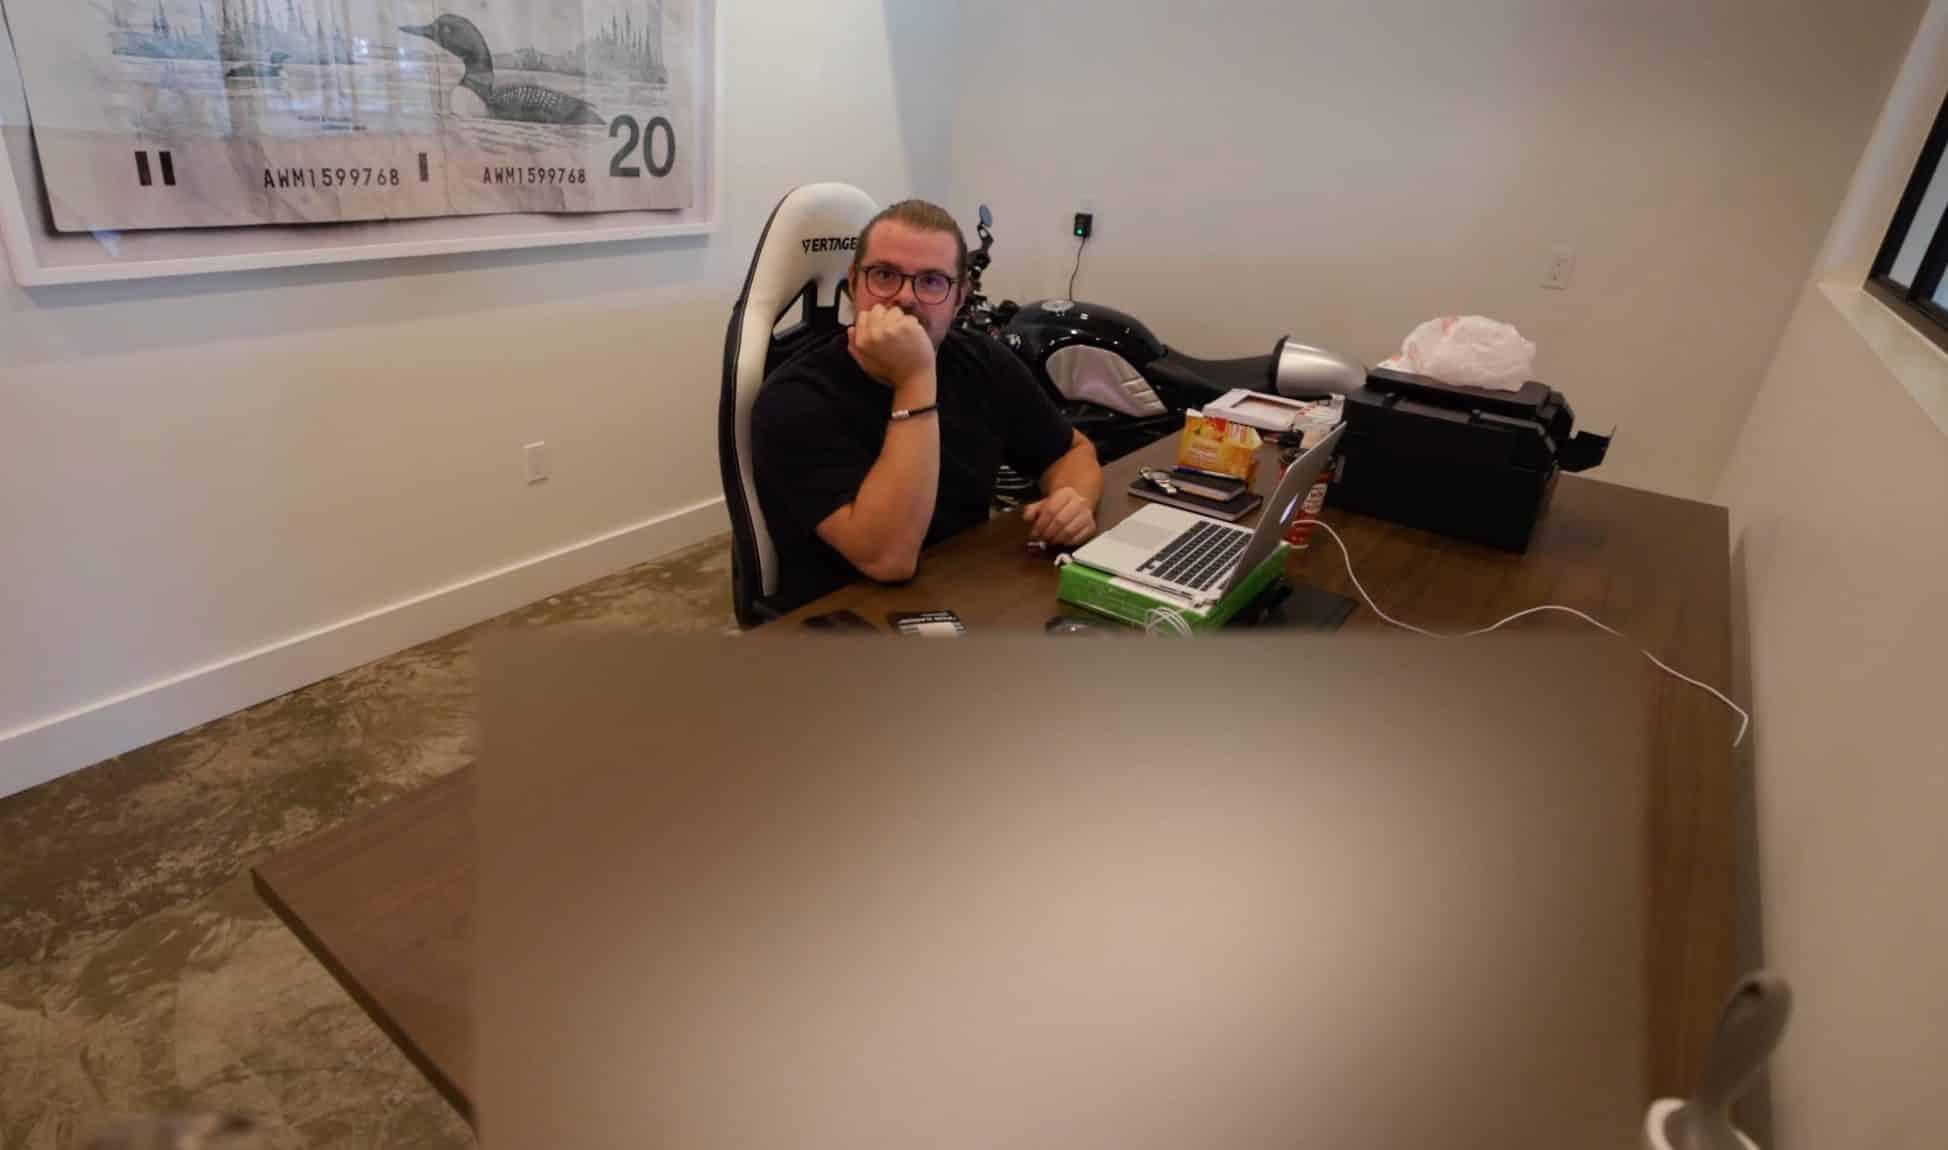 Peter McKinnon accidentally shows DJI Action 2 camera